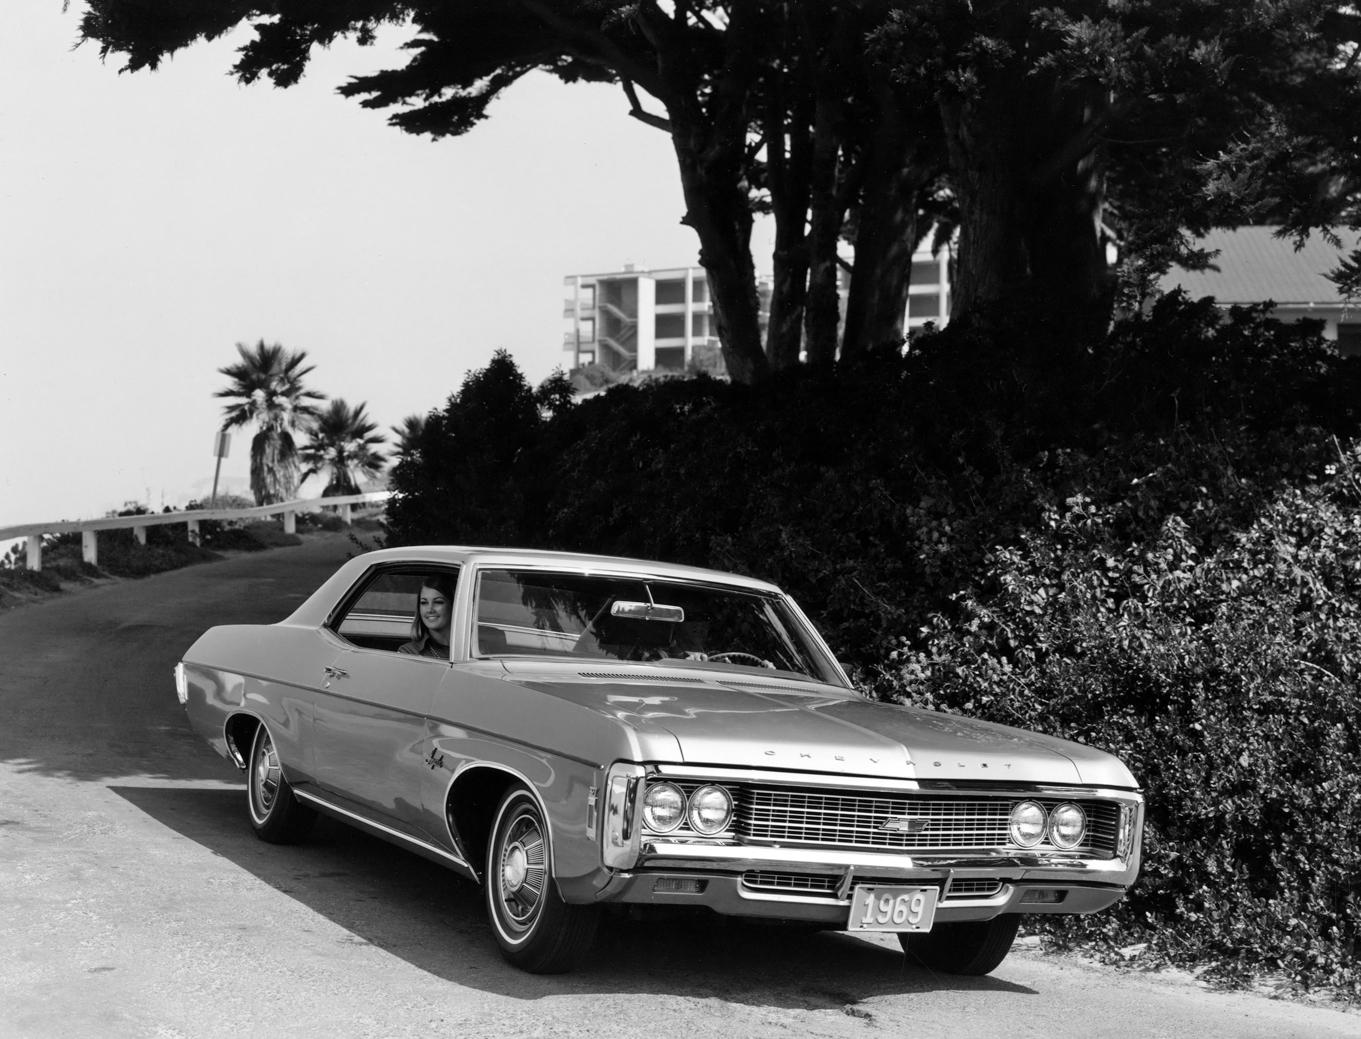 1969-chevrolet_impala-03.jpeg